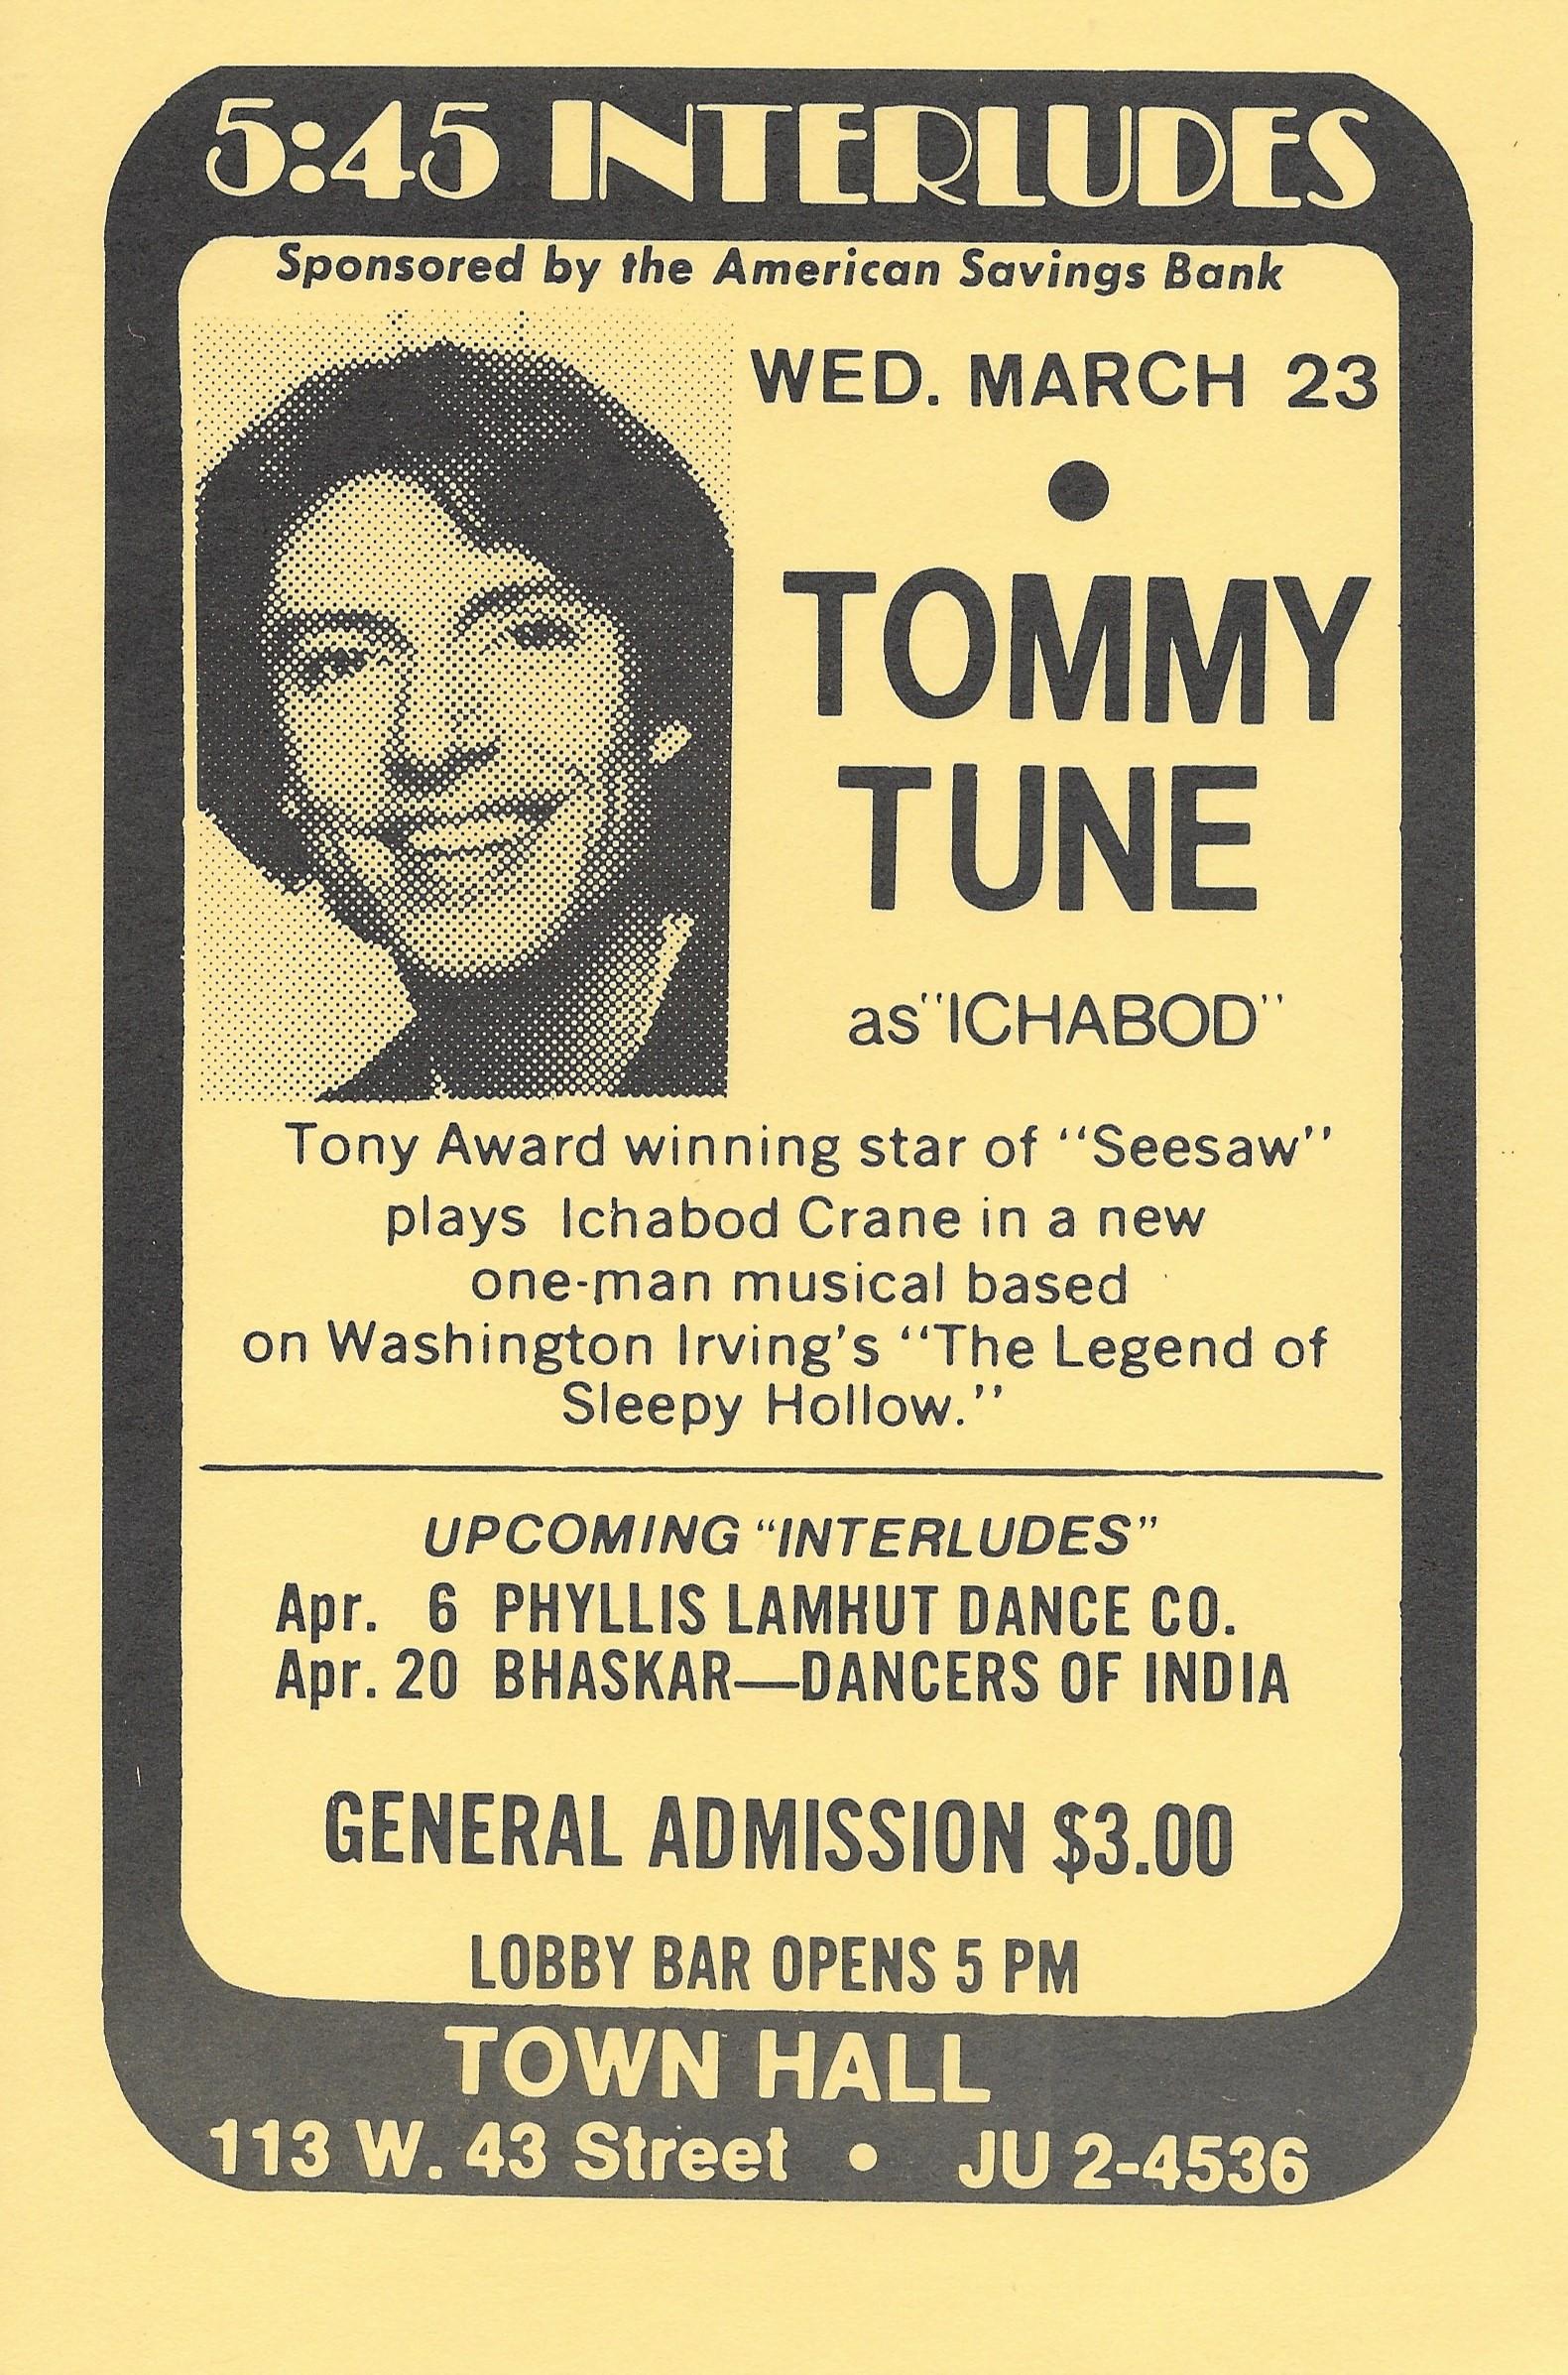 Tommy Tune Ichabod 77.jpg